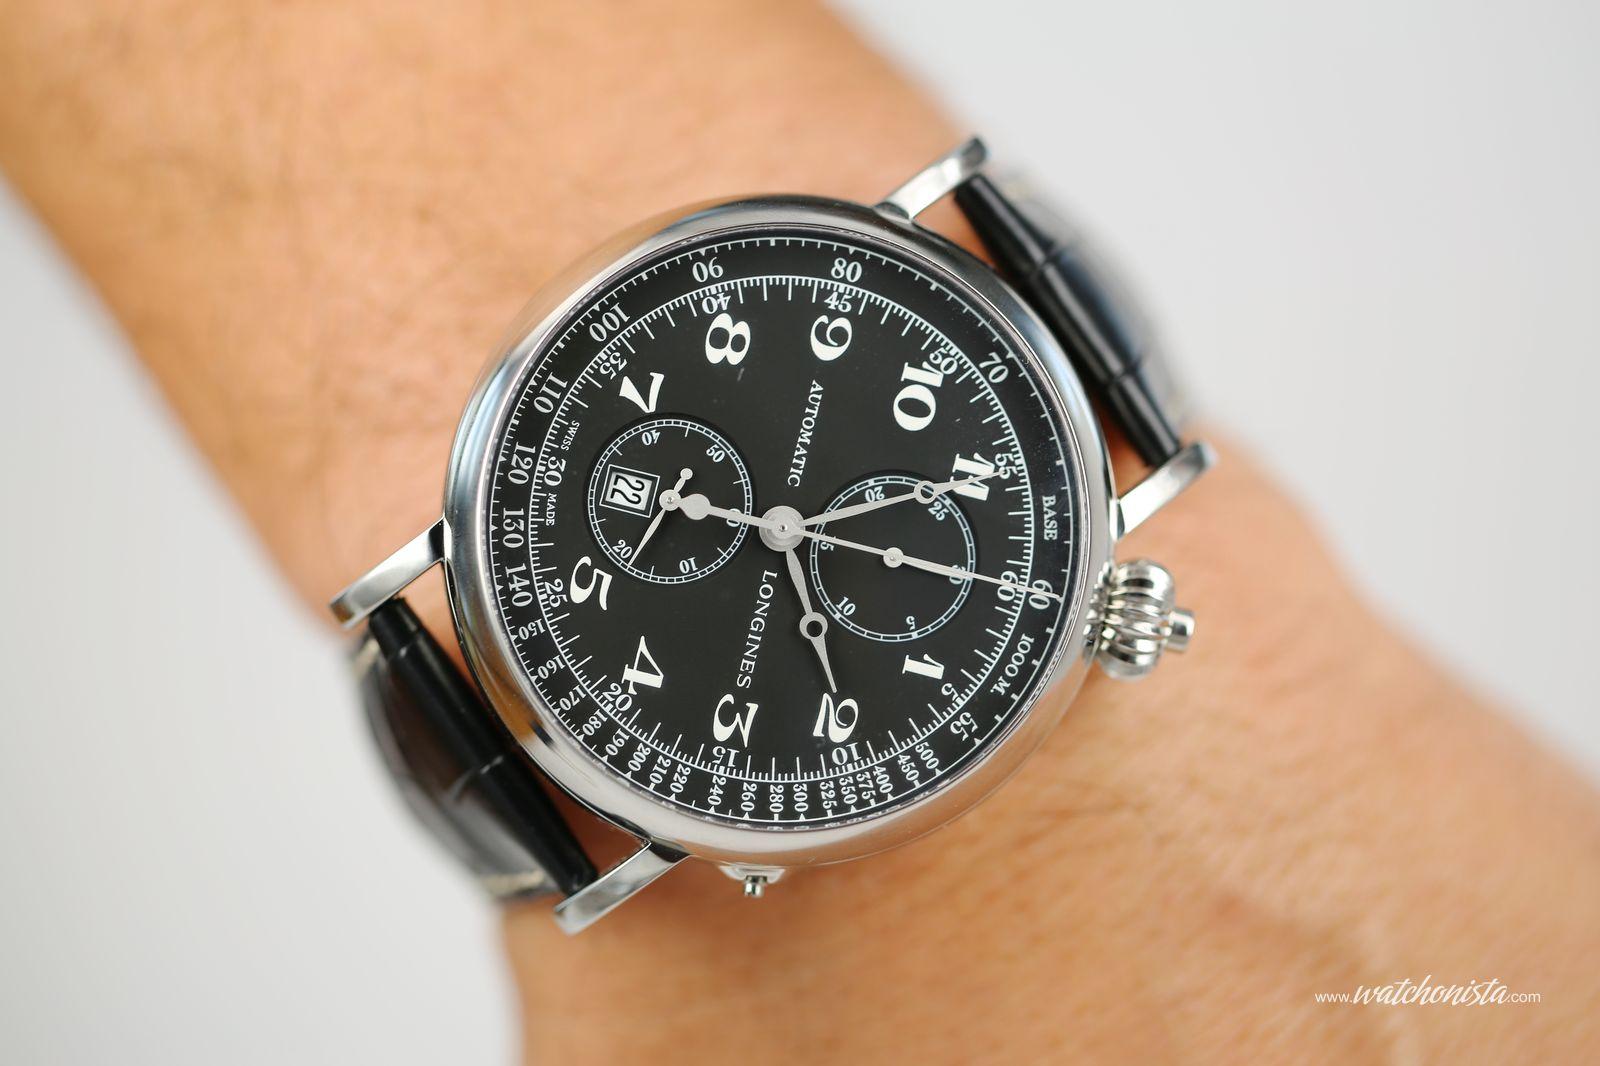 dress - Stylish very watches video